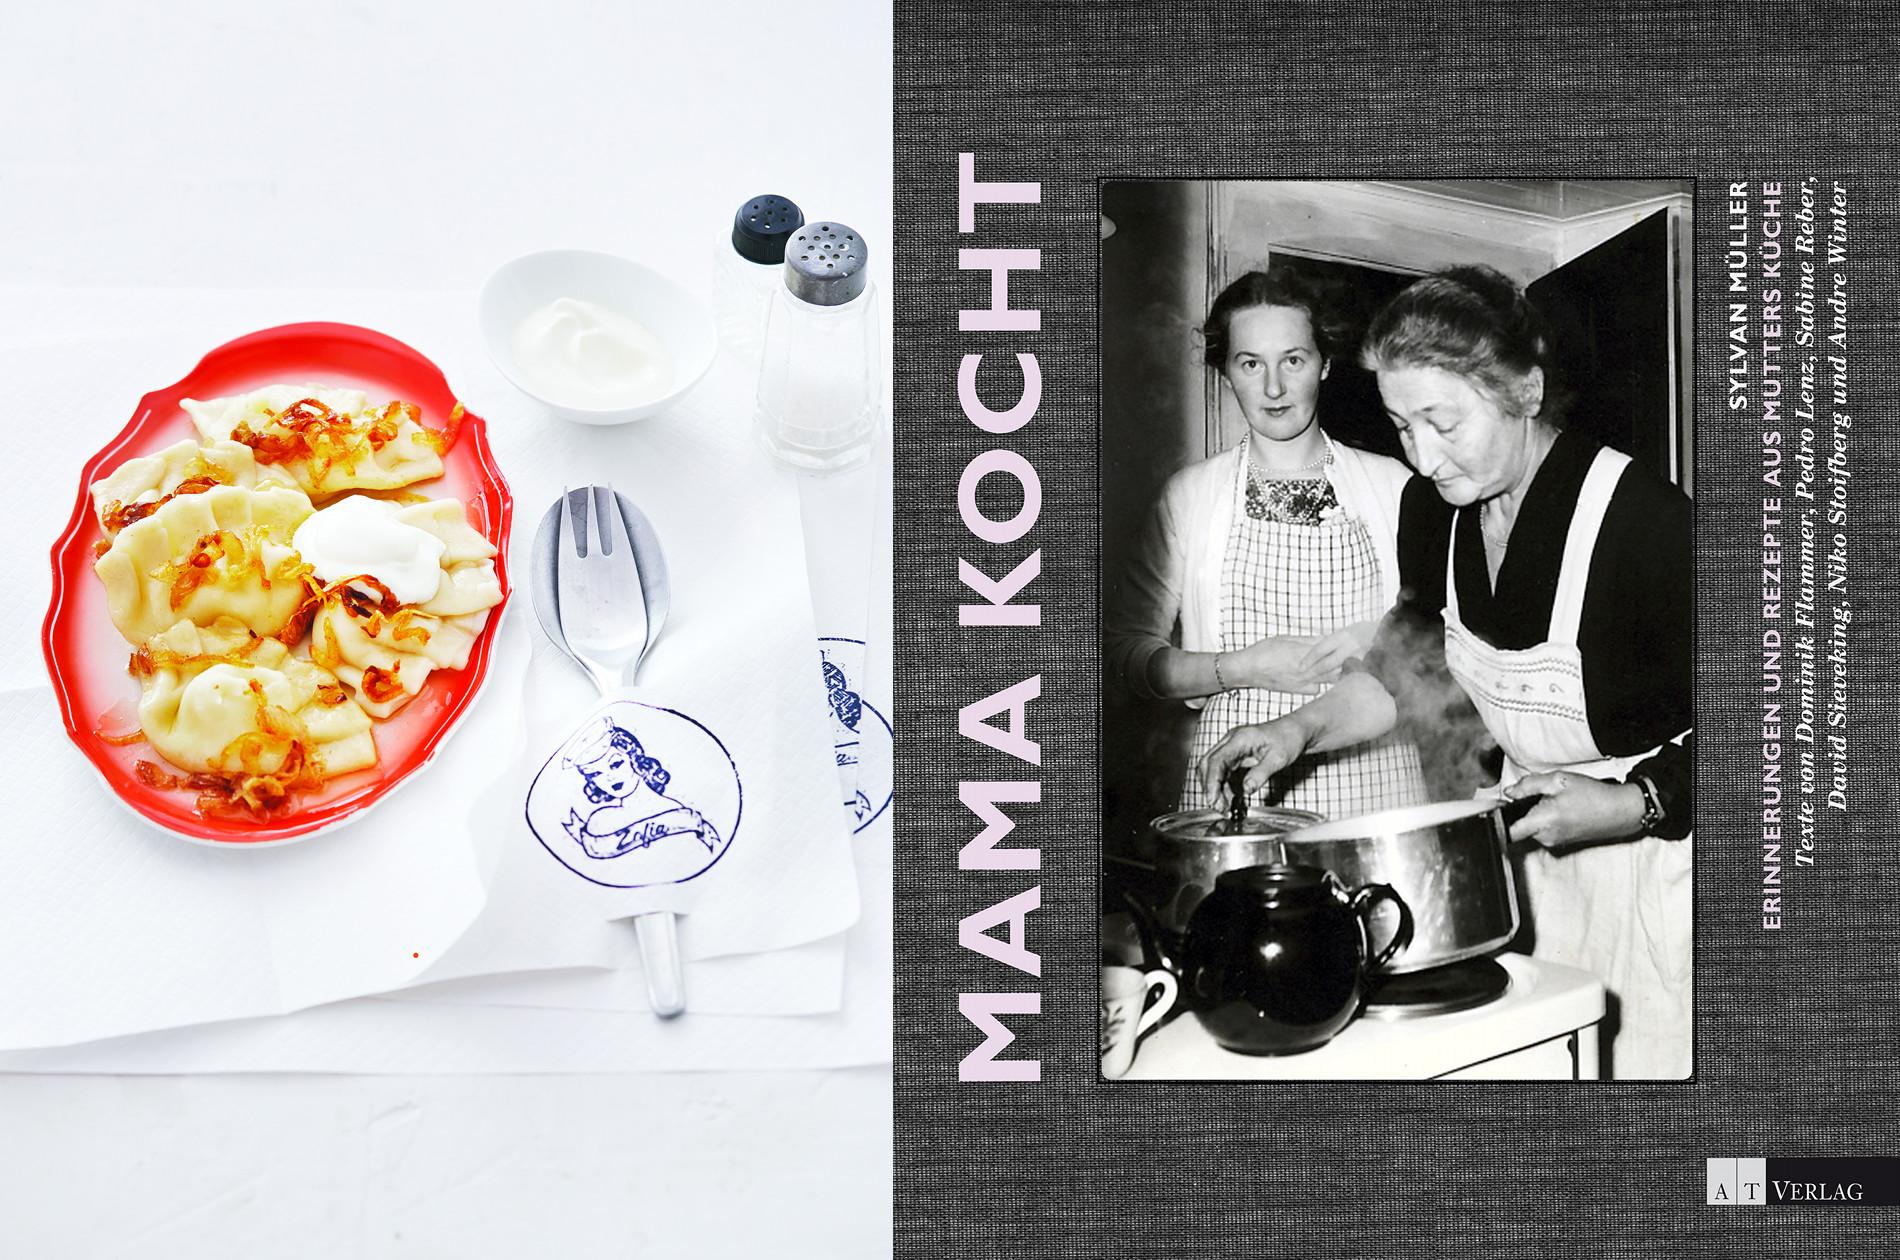 Kochbuch: Mama kocht | cookionista